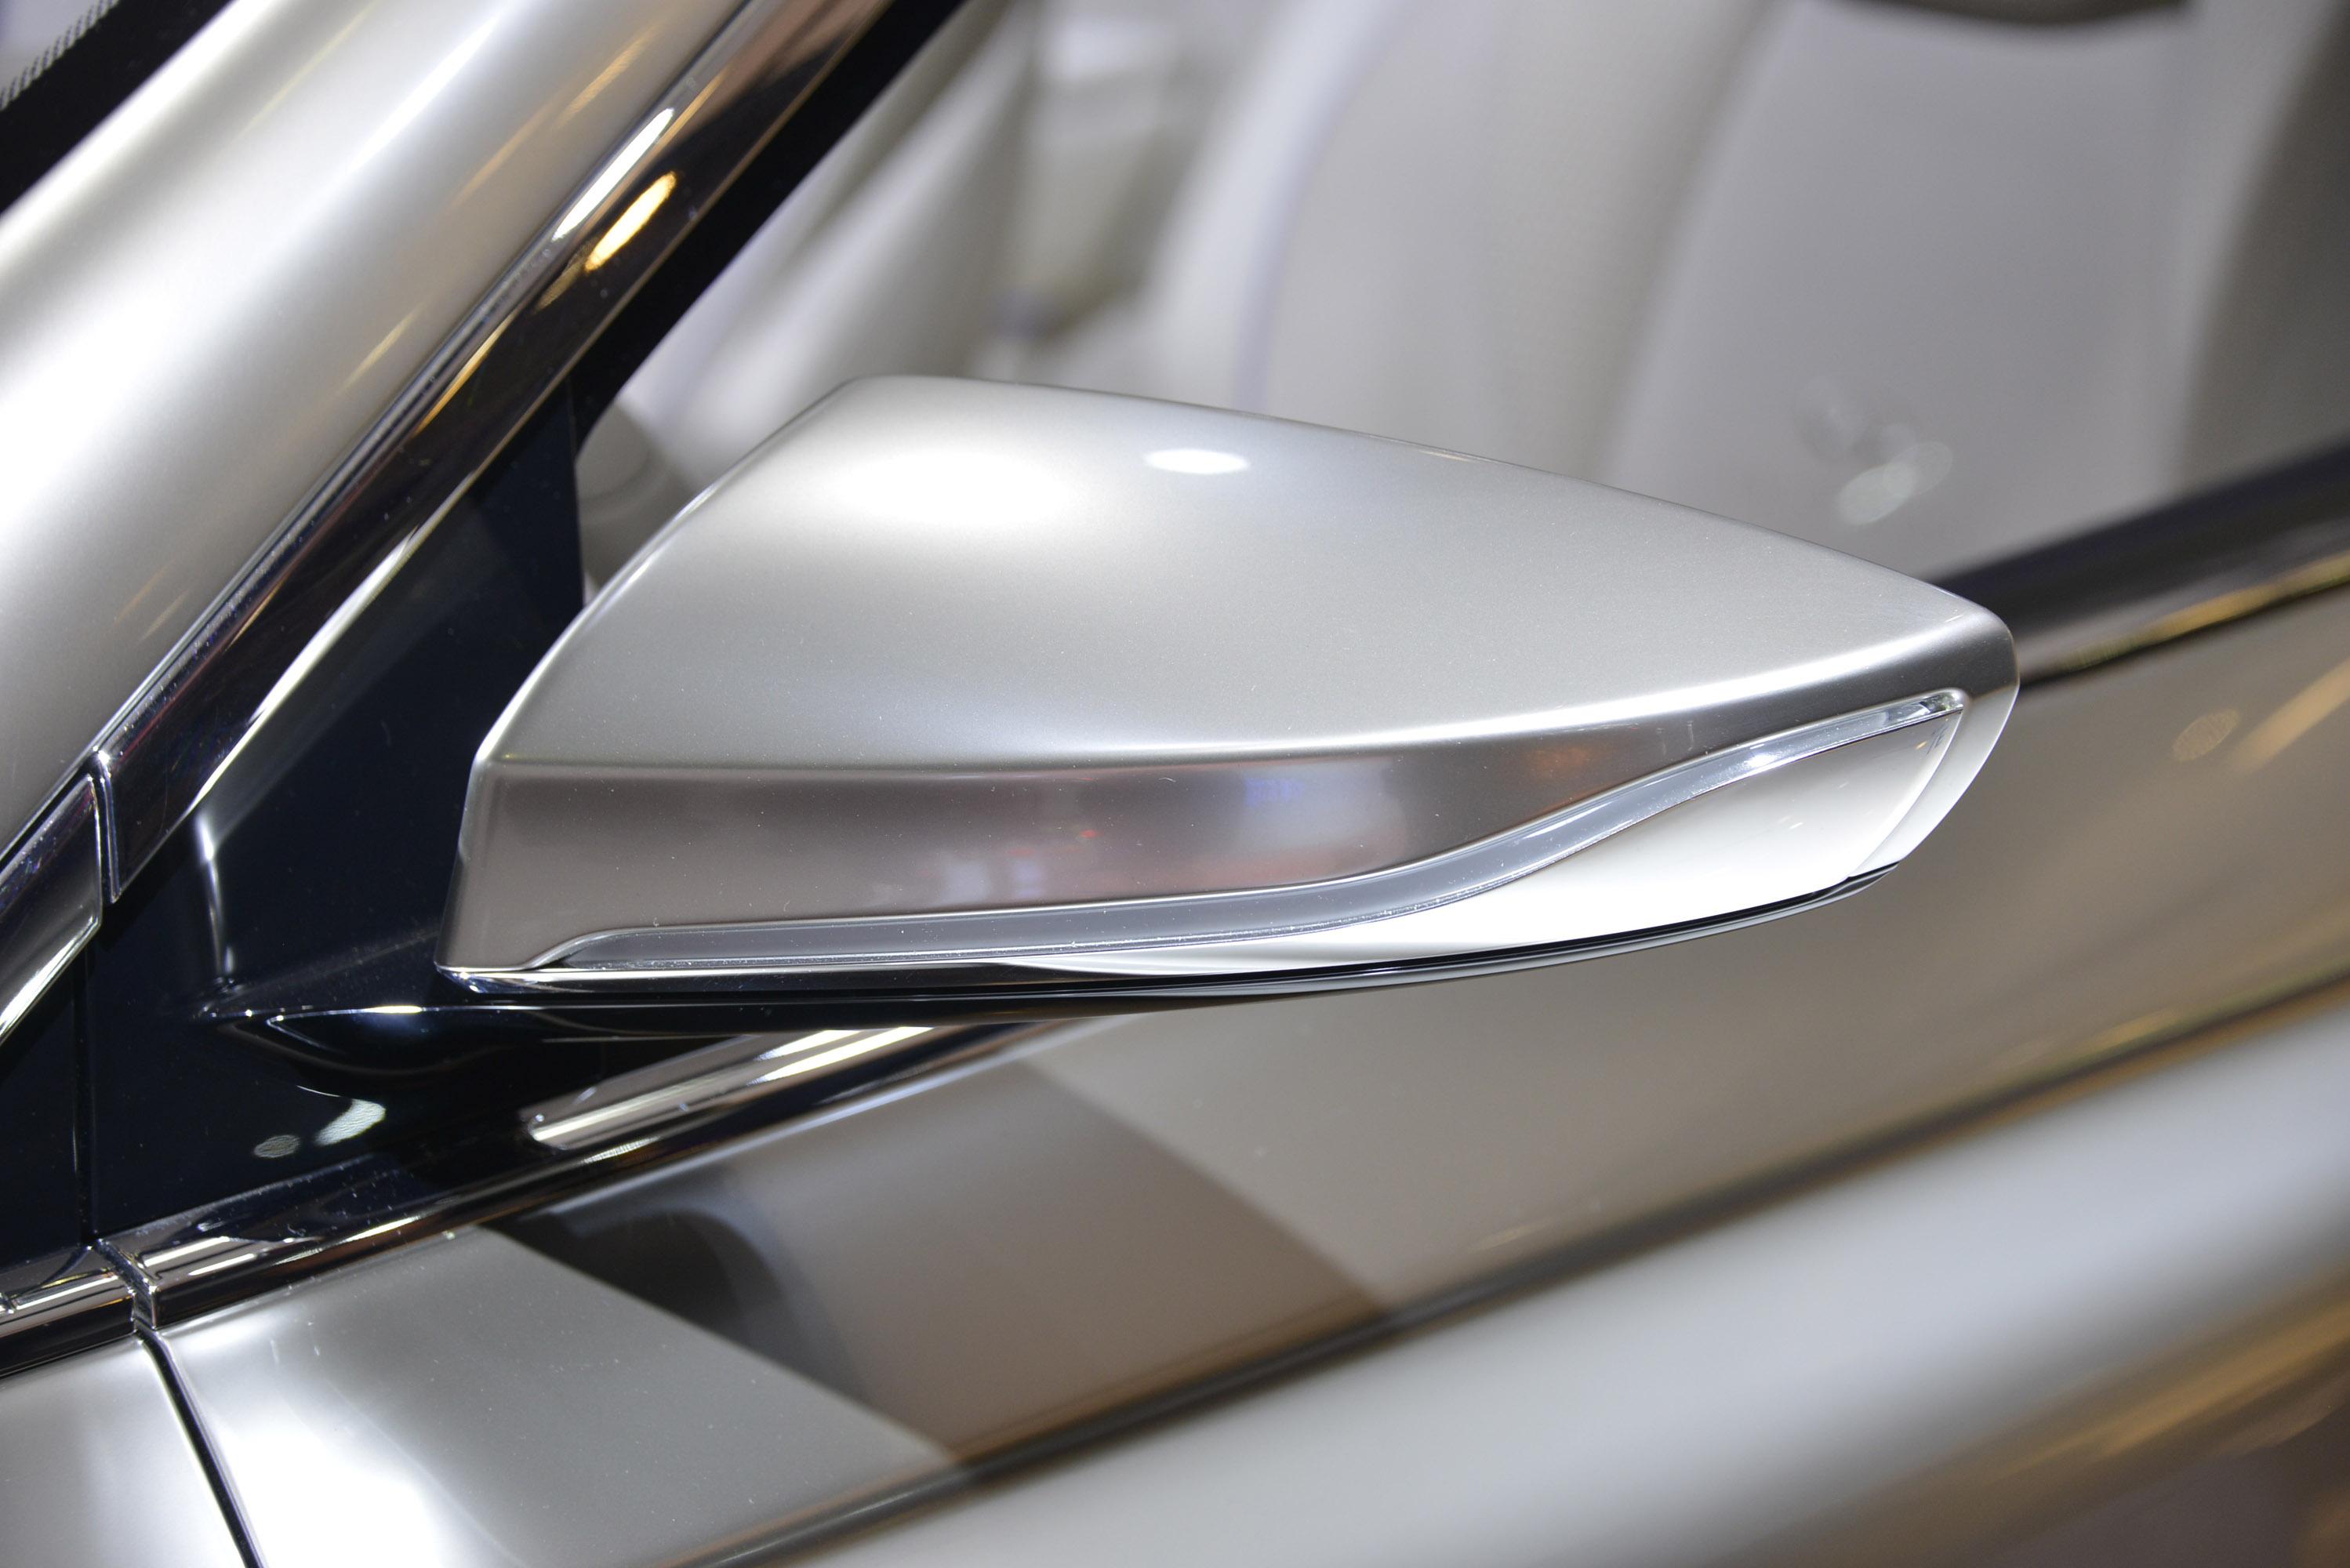 Kelleners sport bmw 3 series f30 picture 71066 2013 mini clubvan infiniti le concept paris 2012 vanachro Image collections